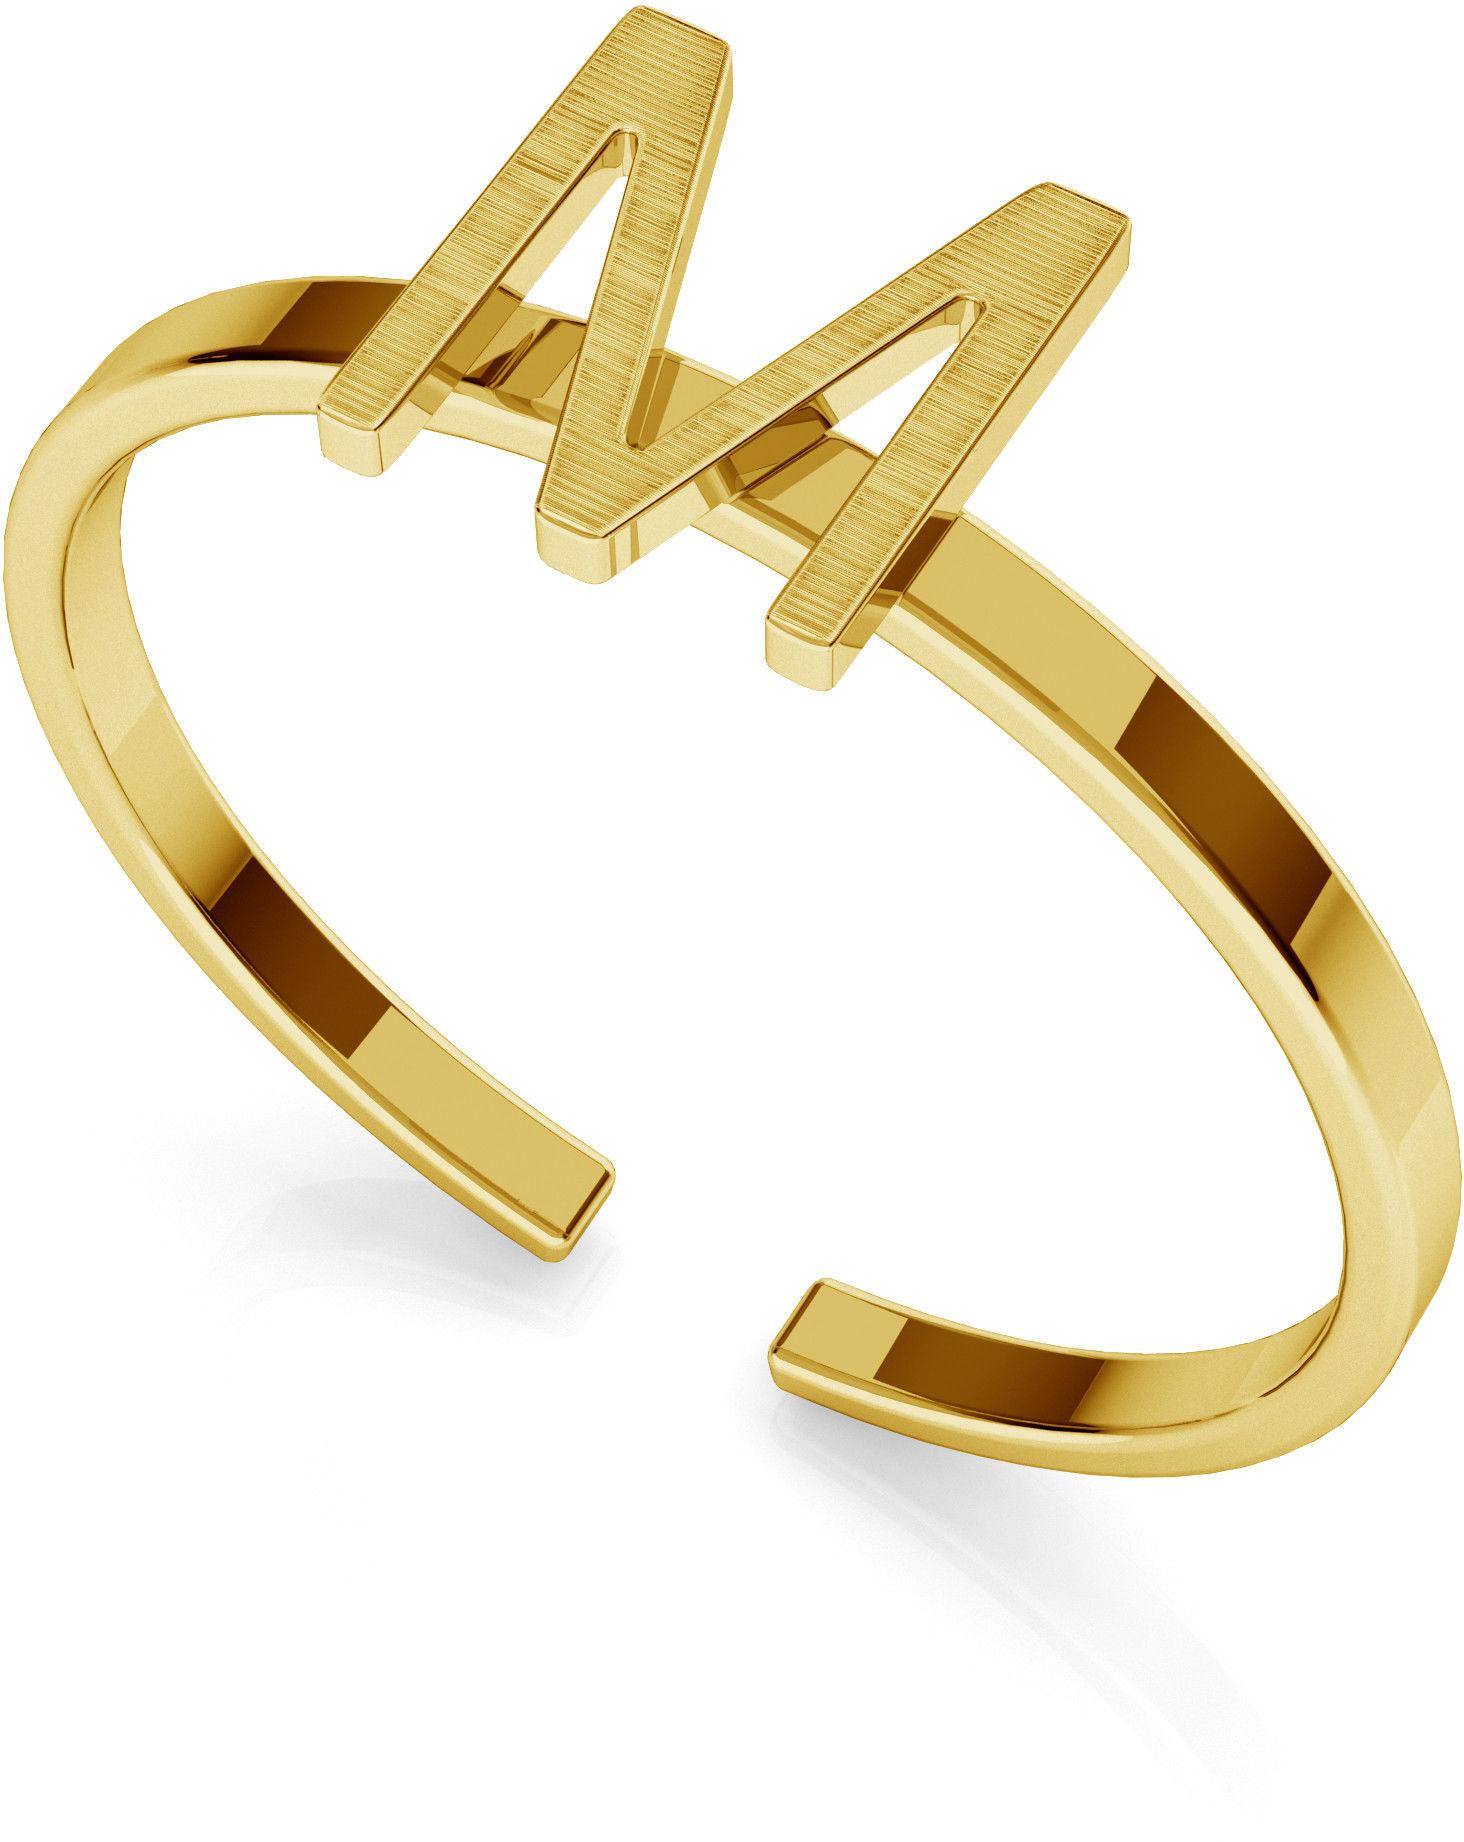 Srebrny pierścionek z literką My RING, srebro 925 : Litera - E, Srebro - kolor pokrycia - Pokrycie platyną